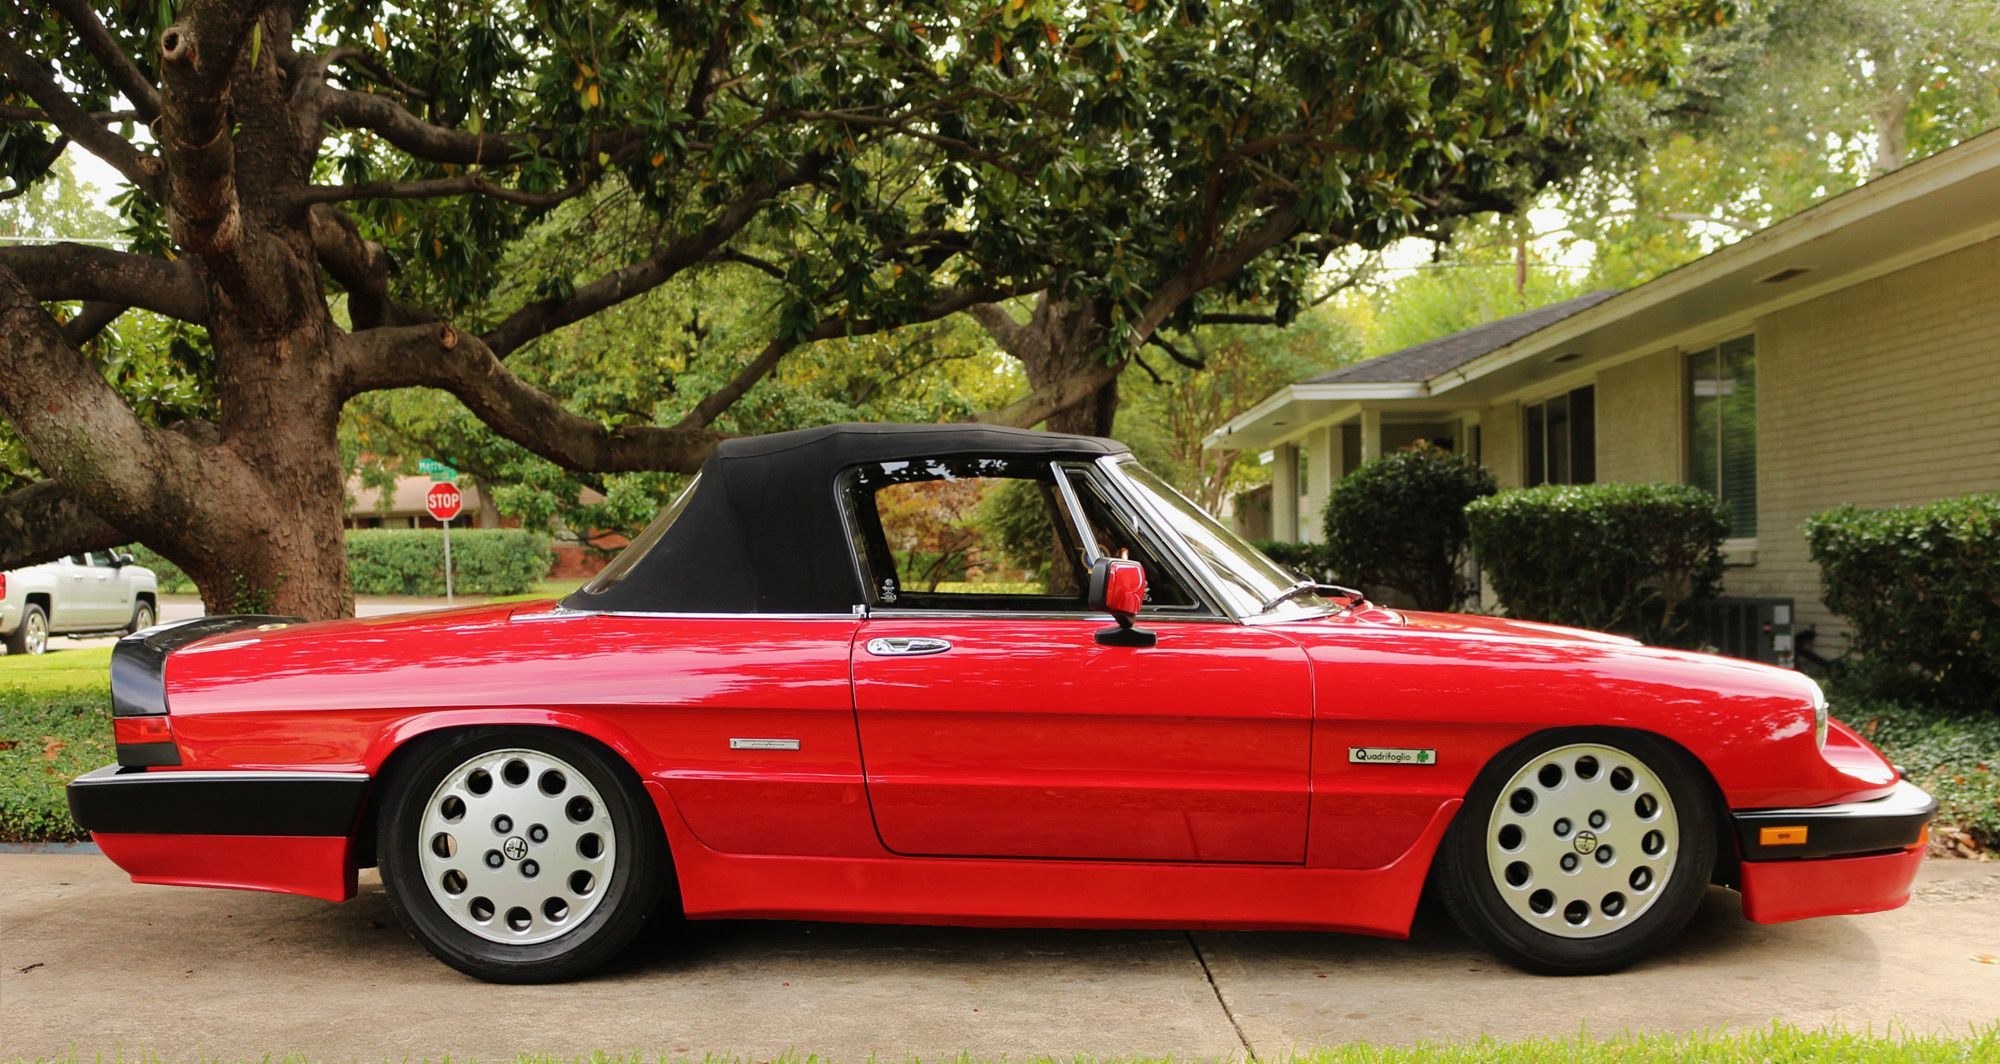 1986 Alfa Romeo Spider Quadrifoglio Alfa Romeo Spider Alfa Romeo Romeo